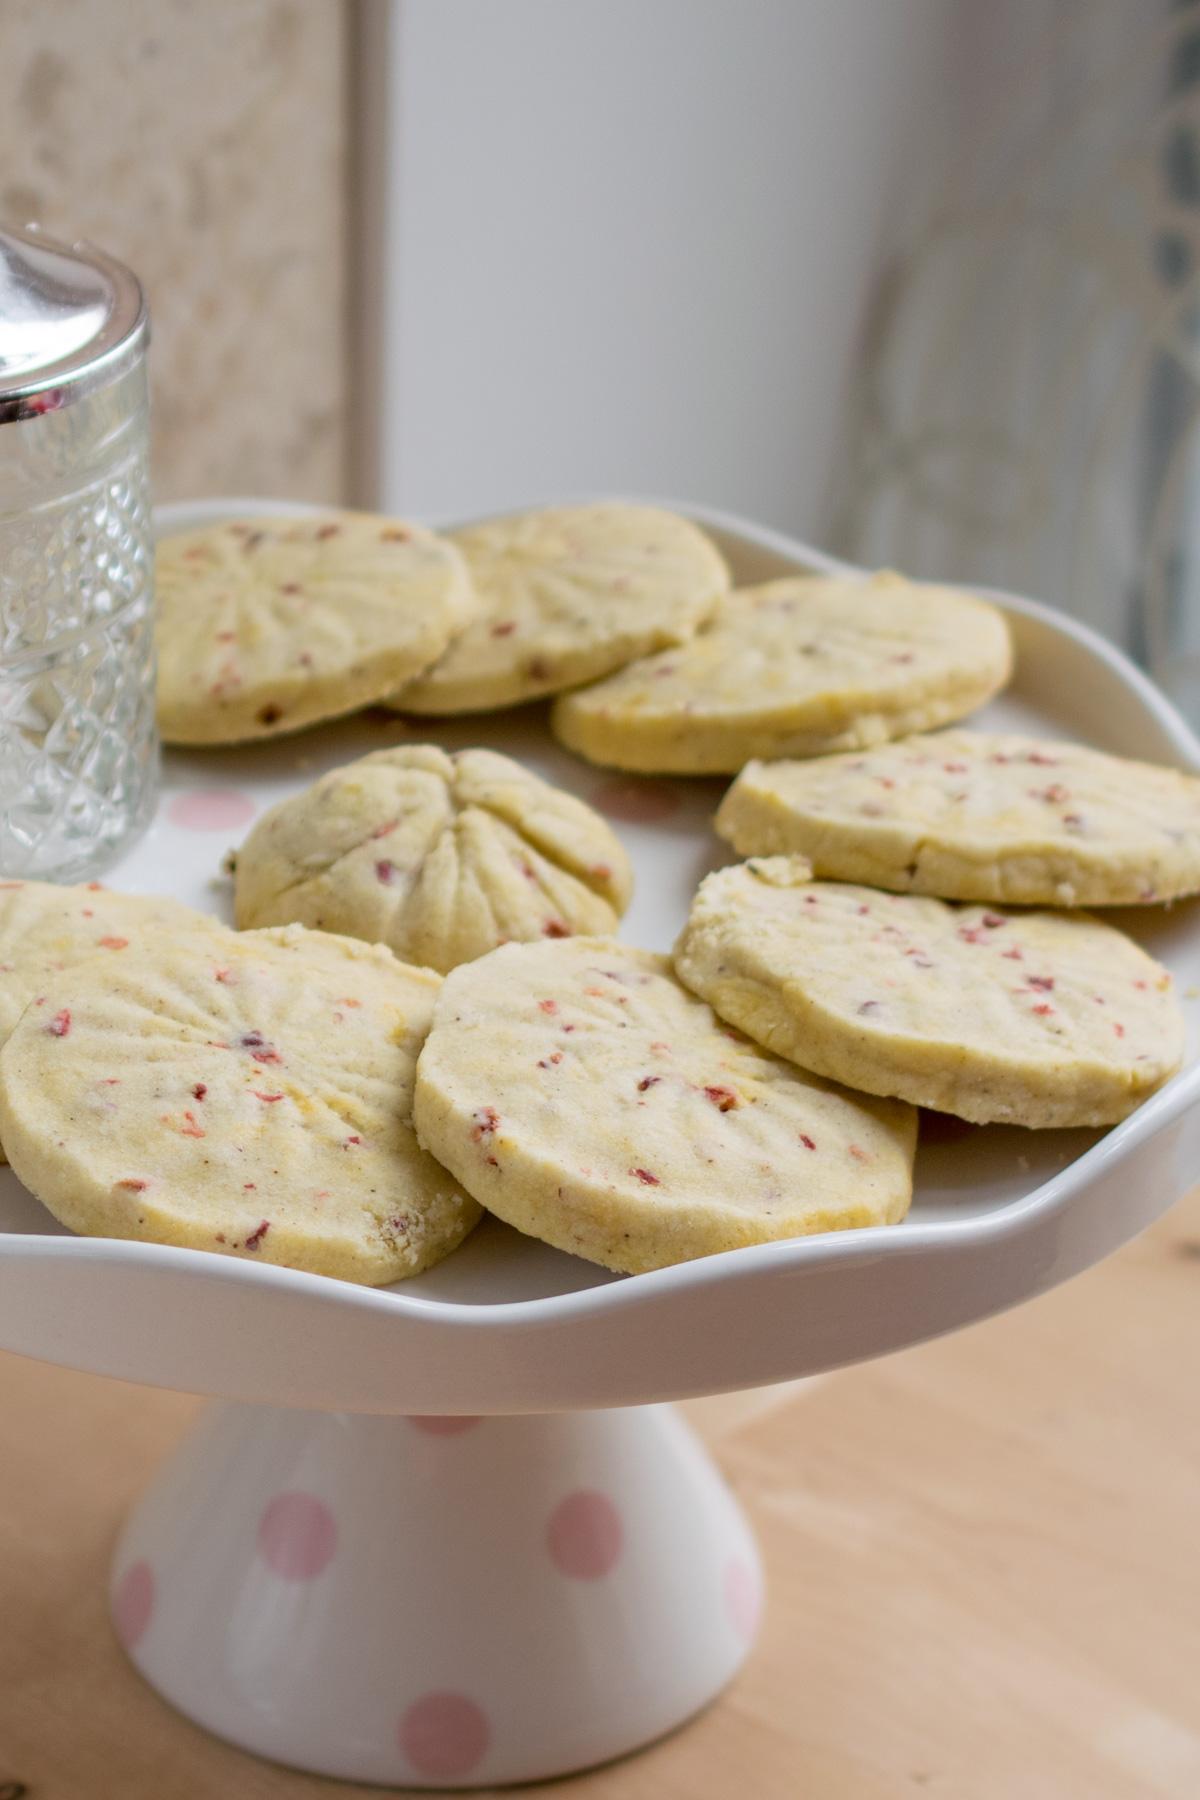 Strawberry Shortbread Biscuits